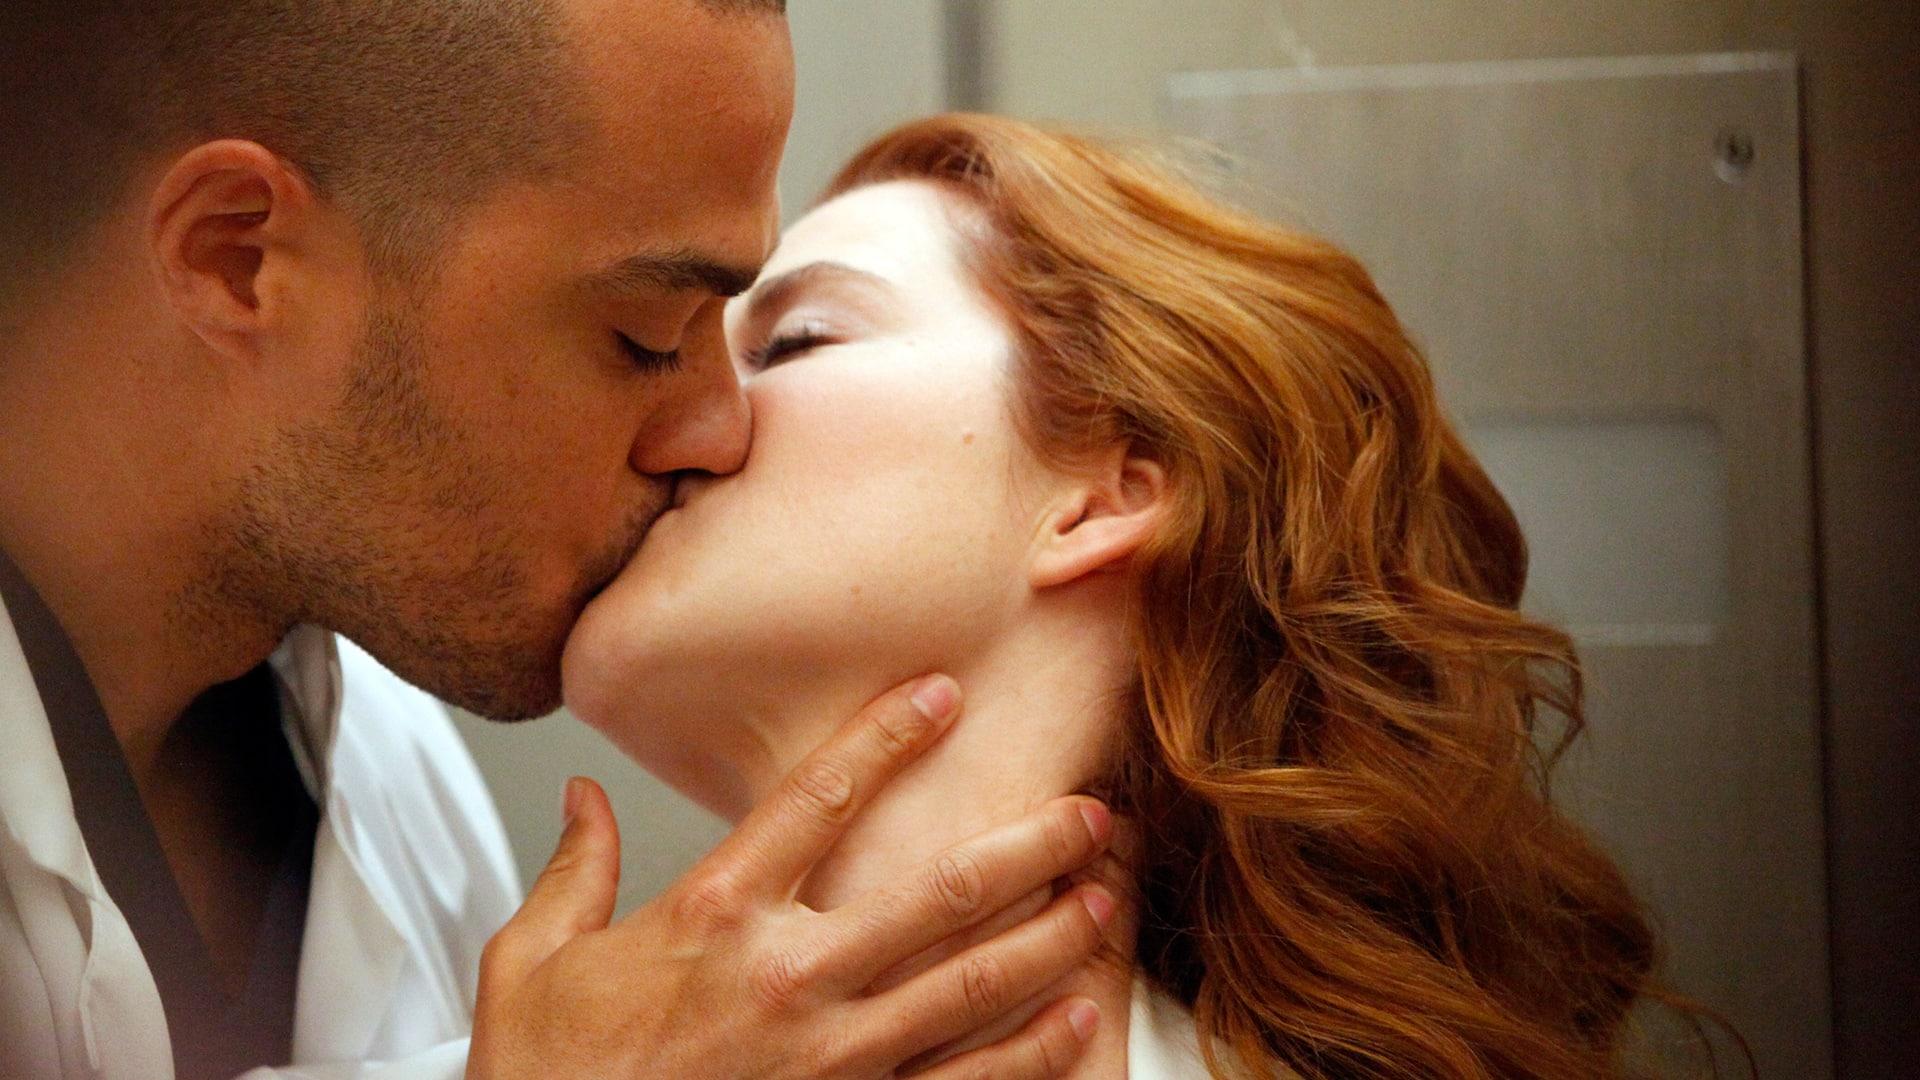 löfte online dating 100 gratis dejtingsajter i Europa